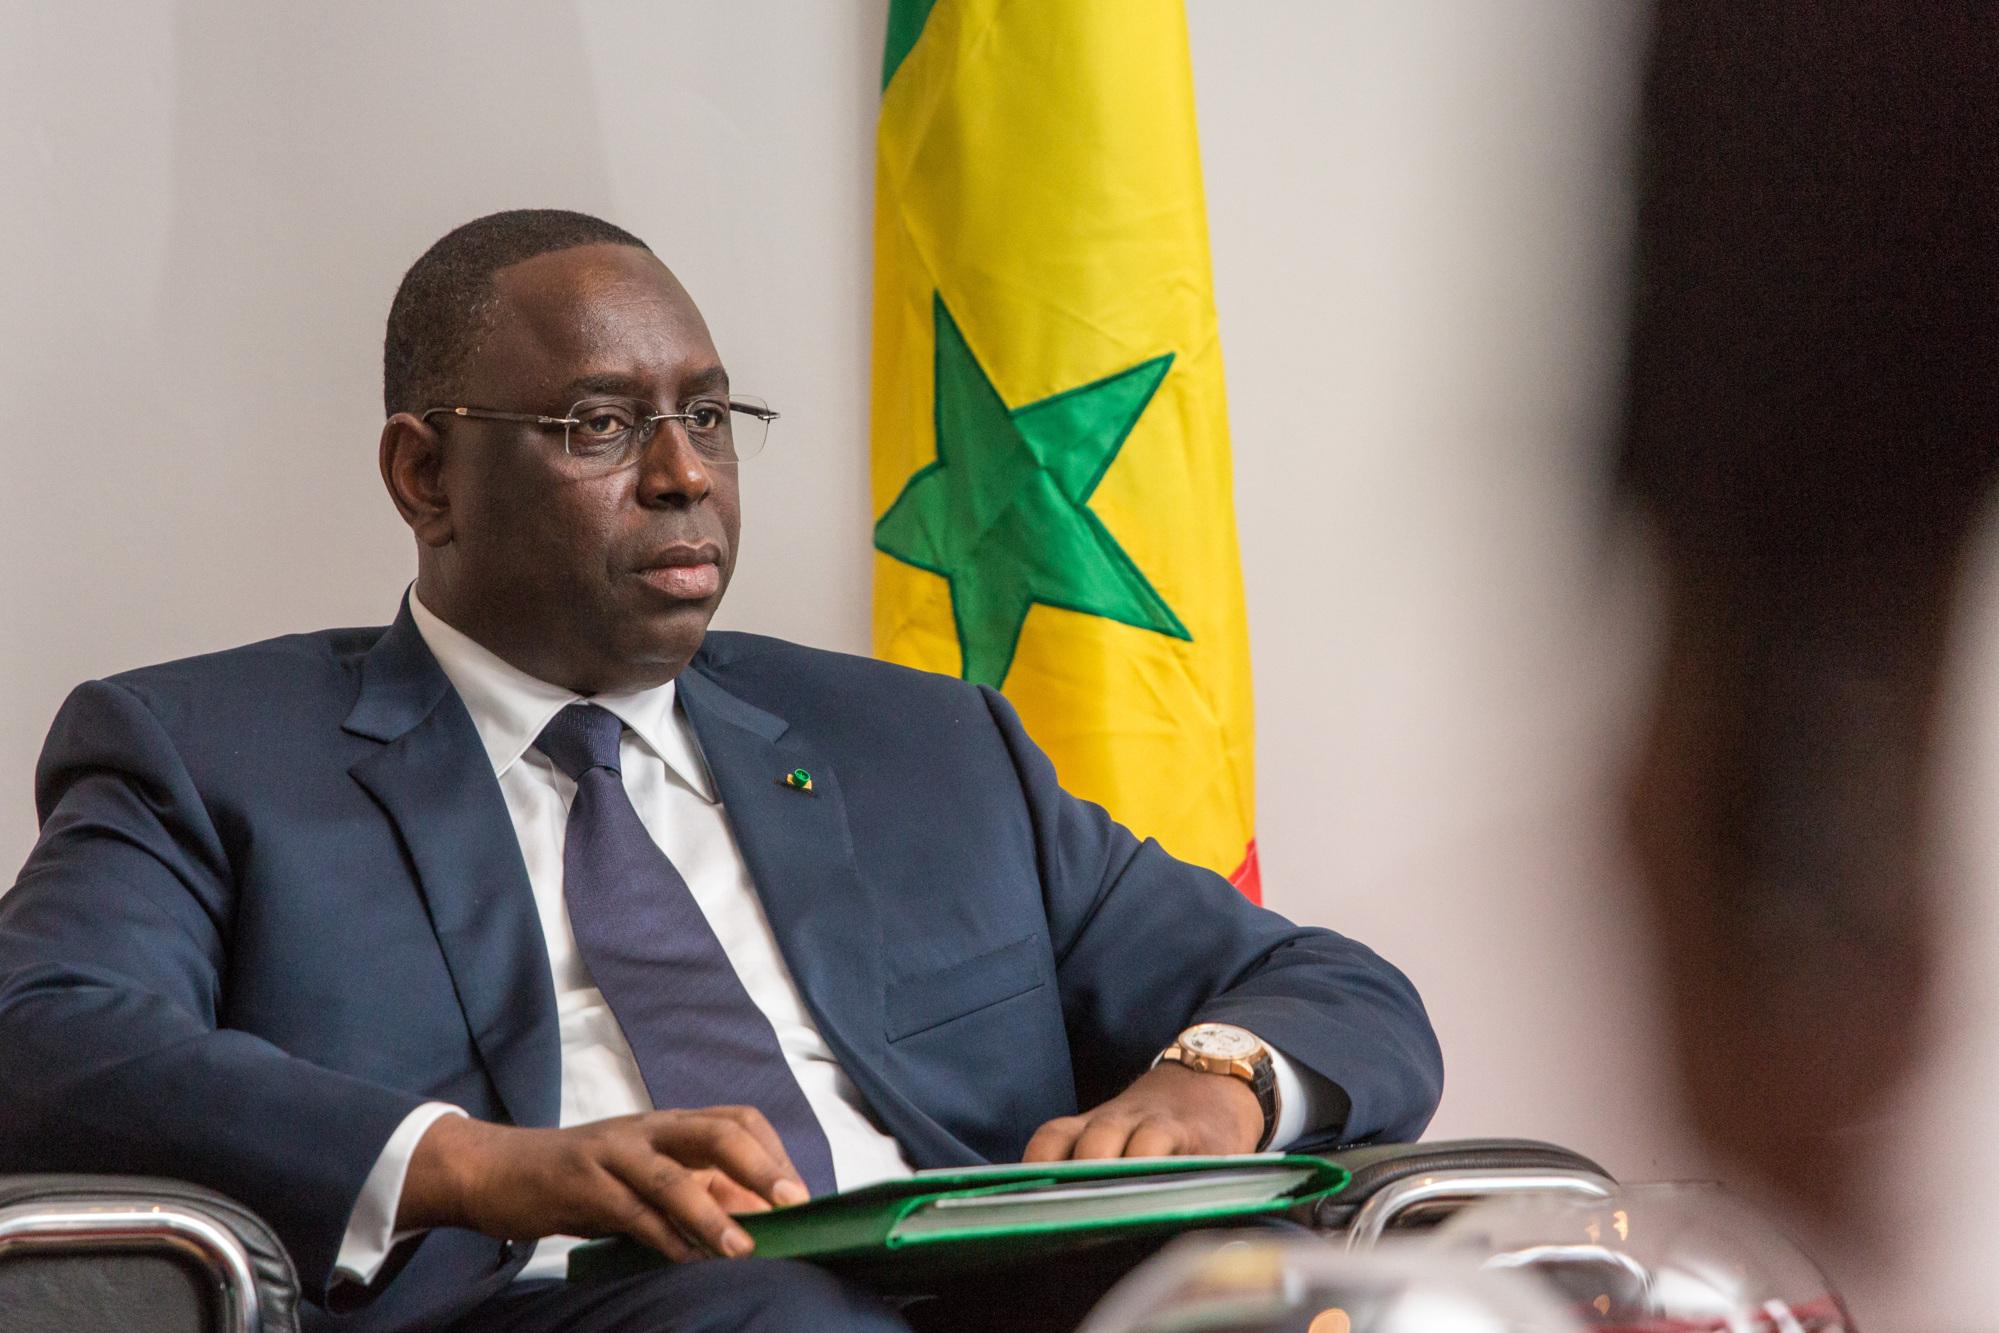 Visite Thiès : l'agenda du président Macky Sall à la « pêche » chez Idrissa Seck